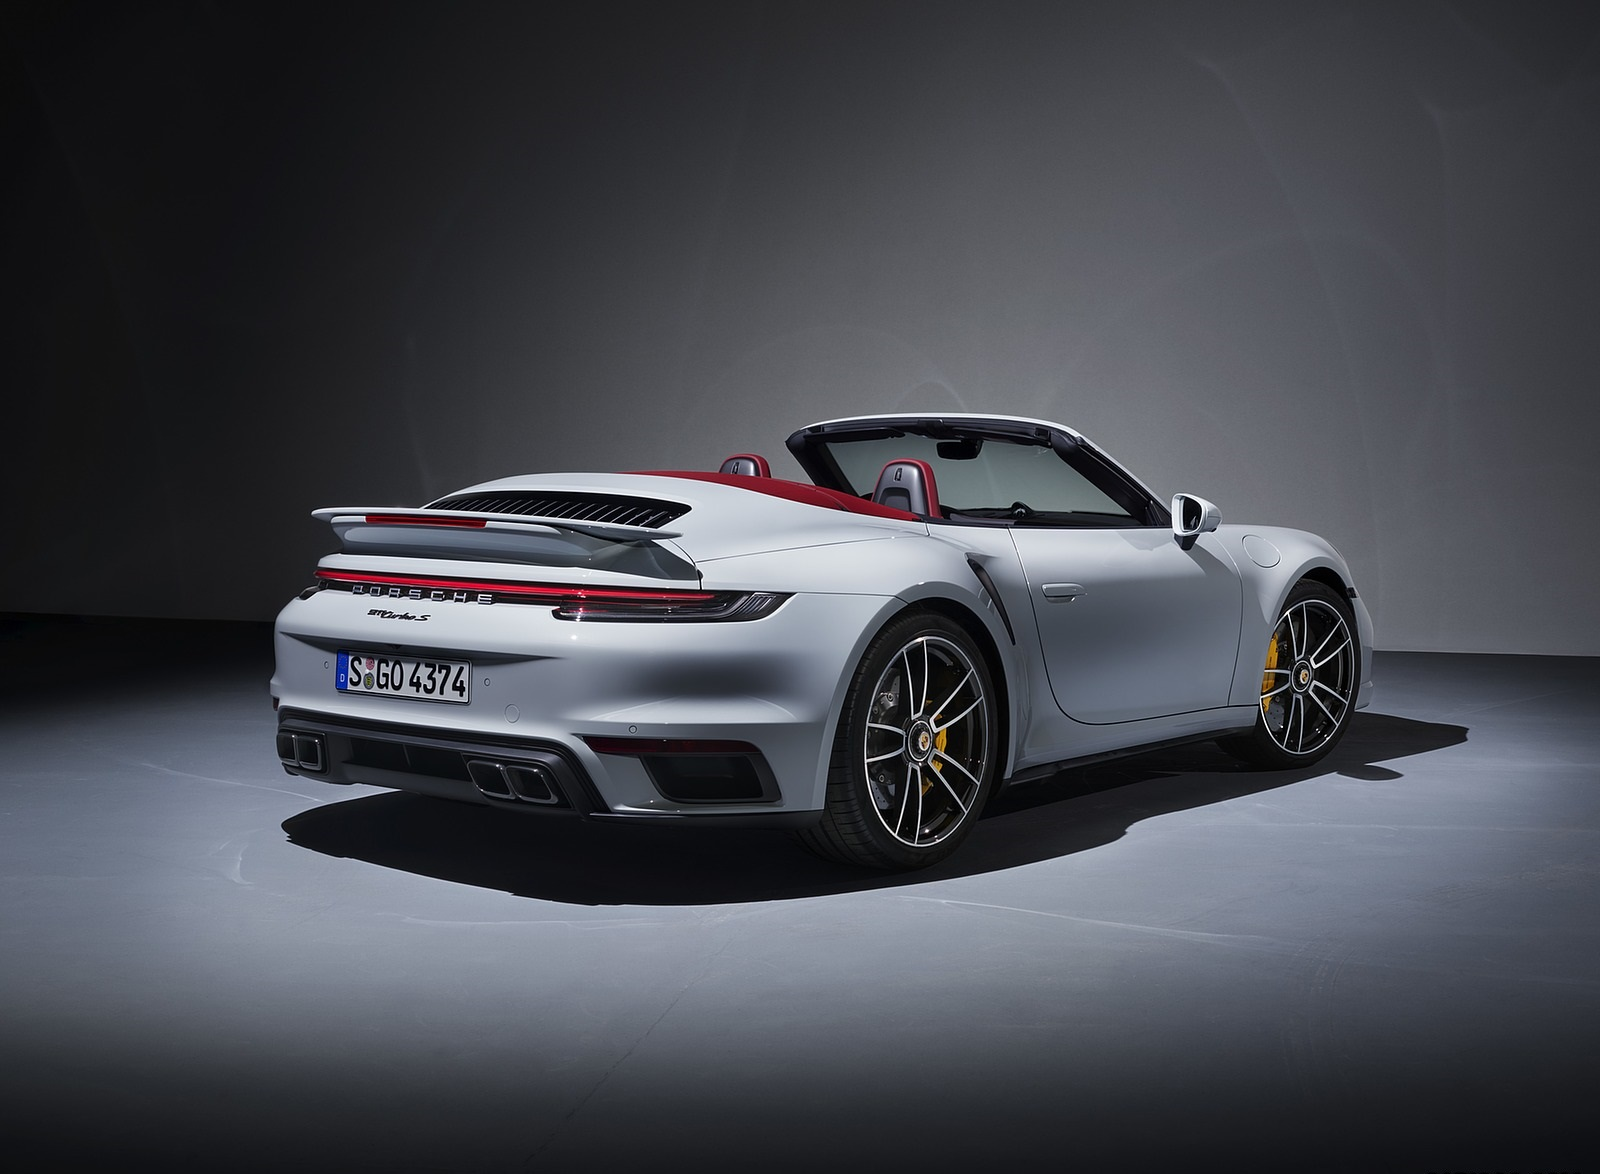 2021 Porsche 911 Turbo S Cabriolet Rear Three-Quarter Wallpapers (2)